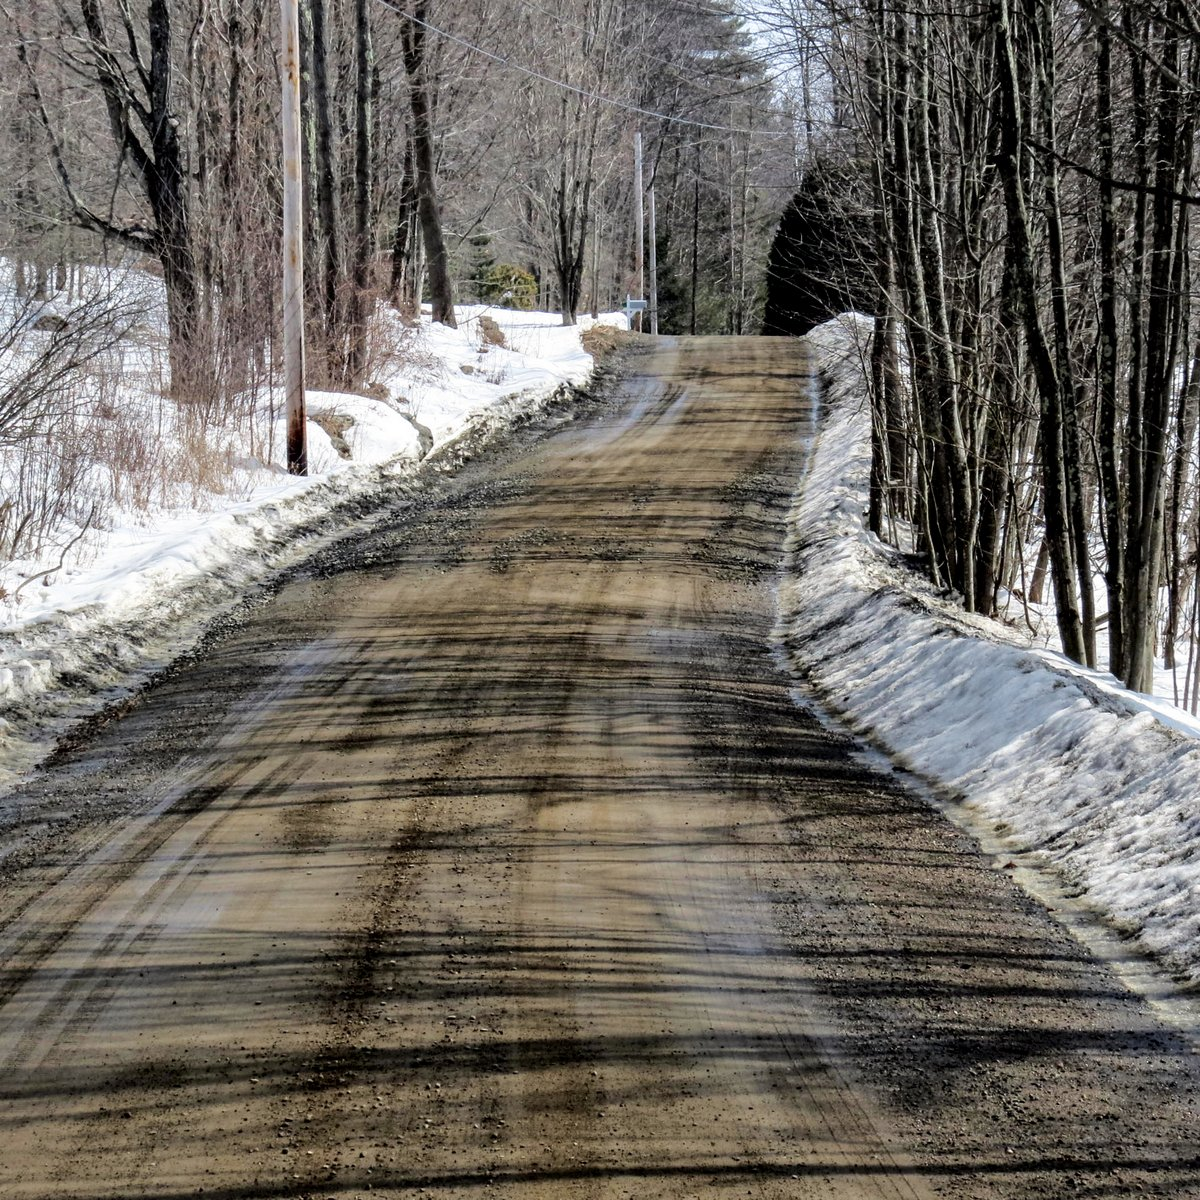 2. Muddy Road